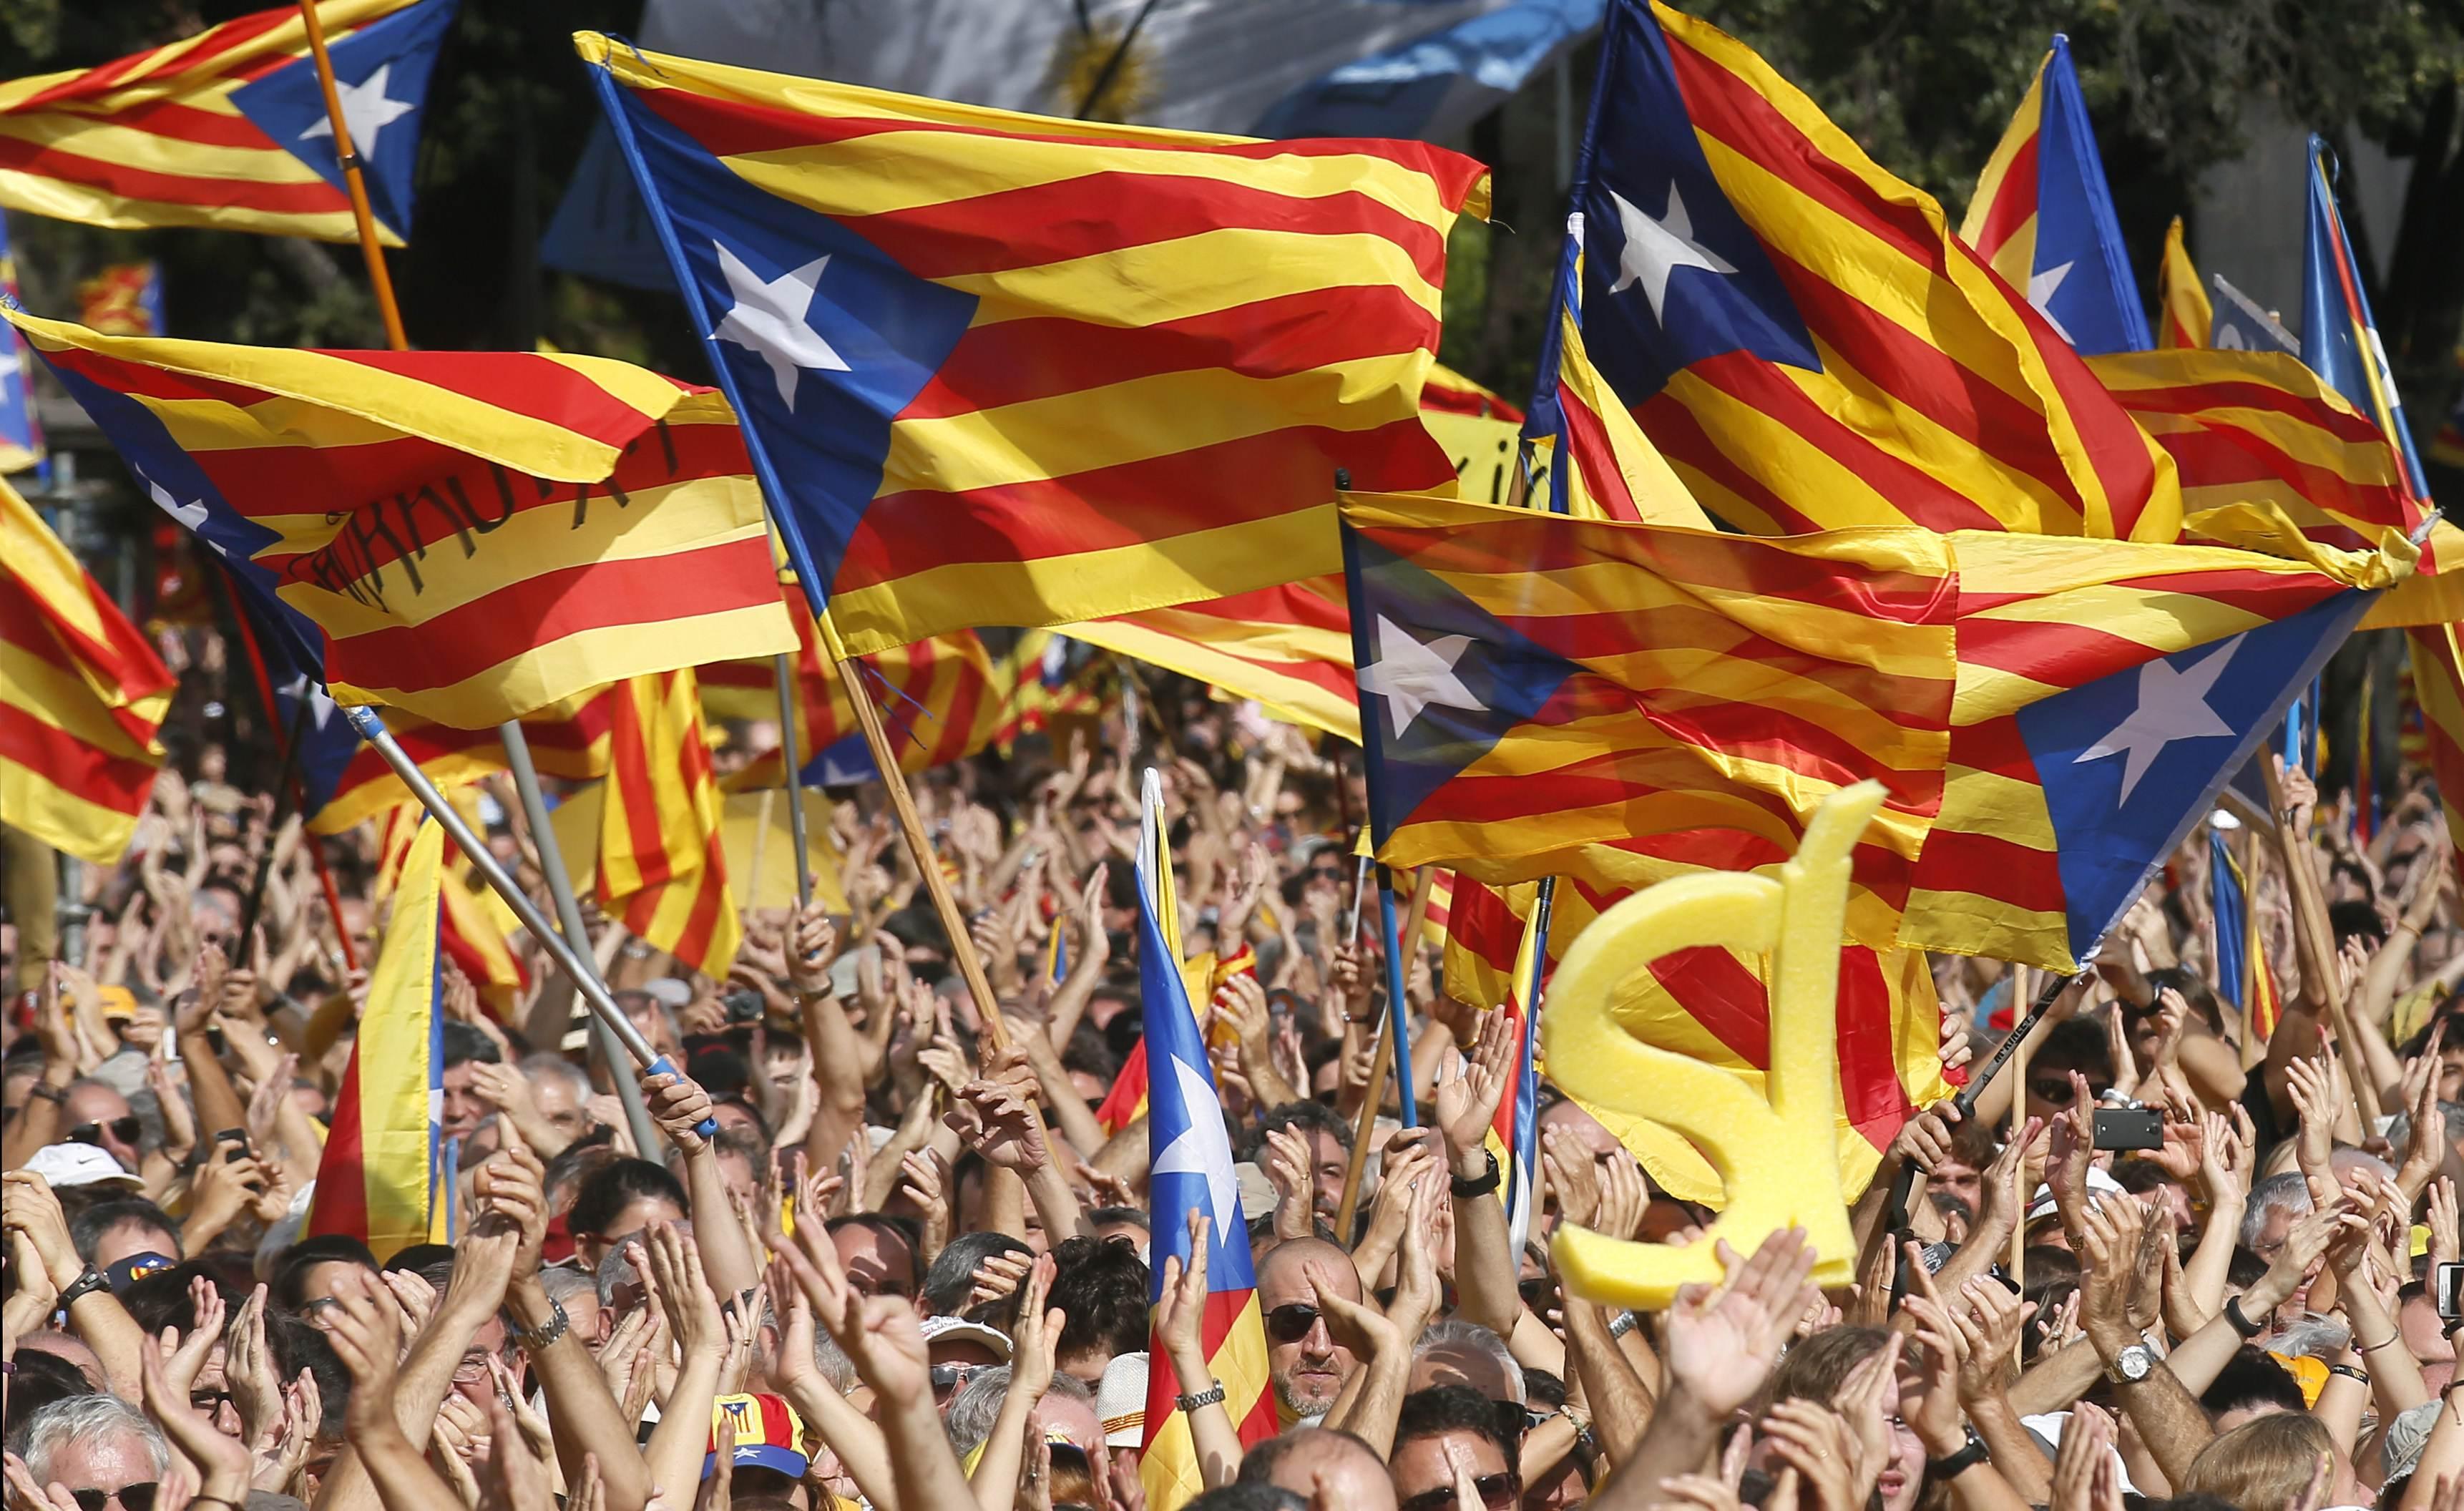 SPAIN-CATALONIA/